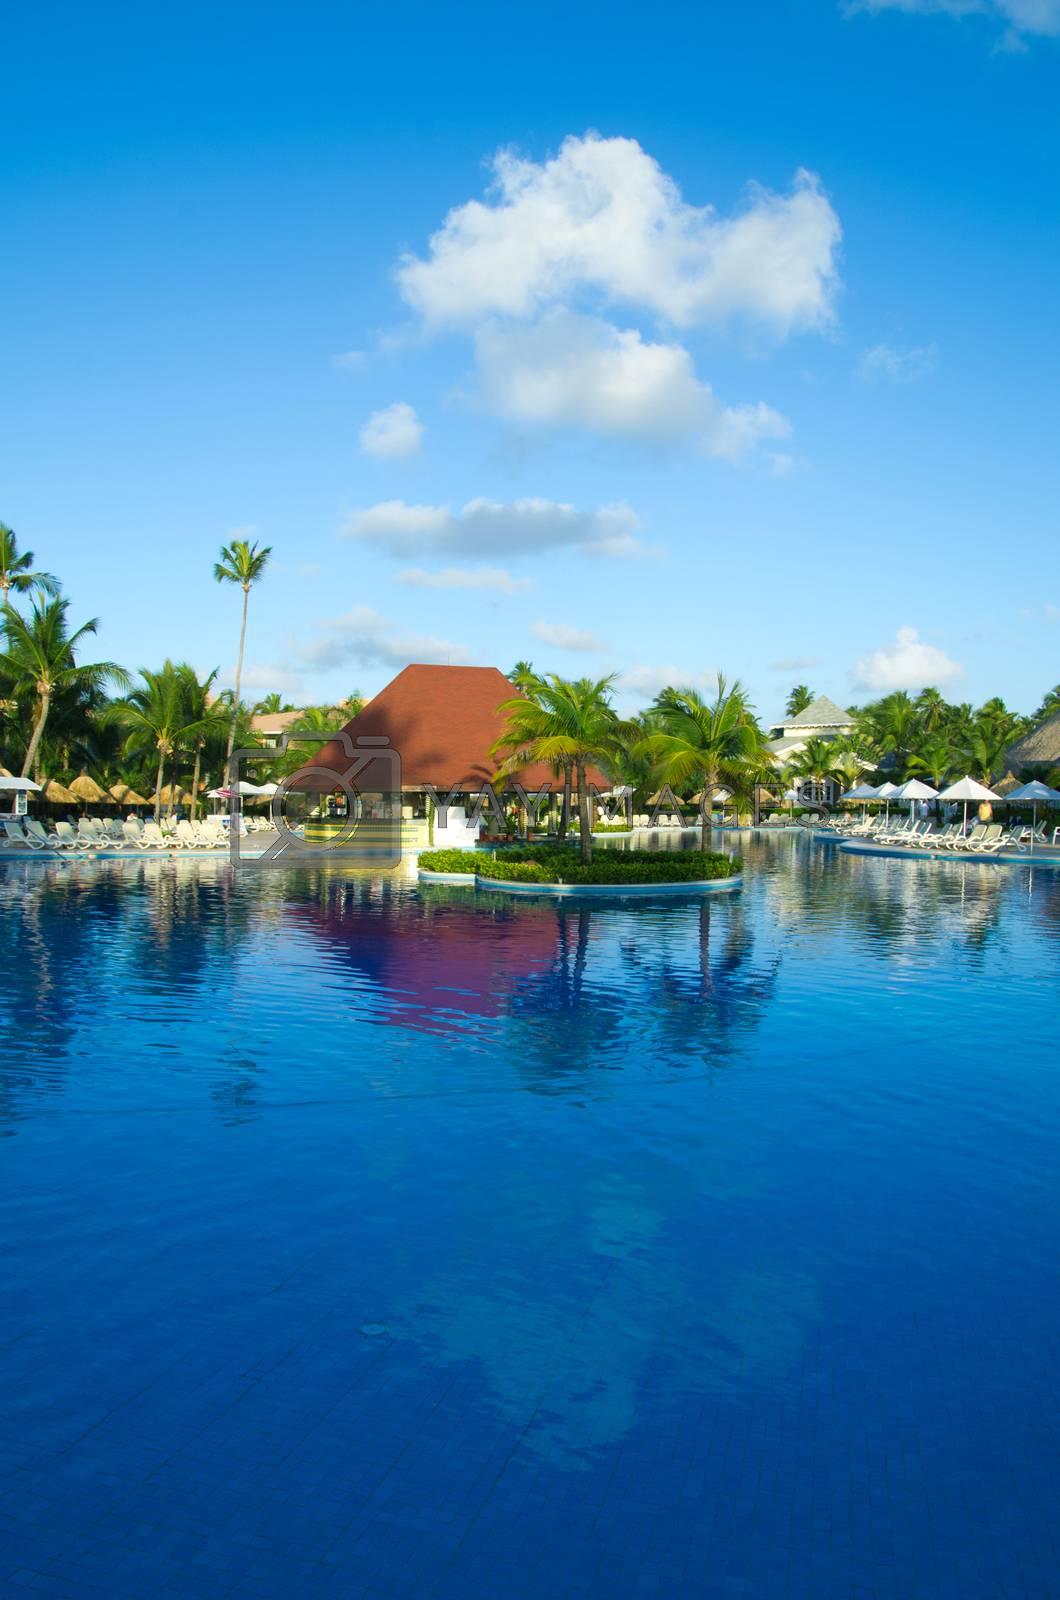 Beautiful swimming pool in Thailand